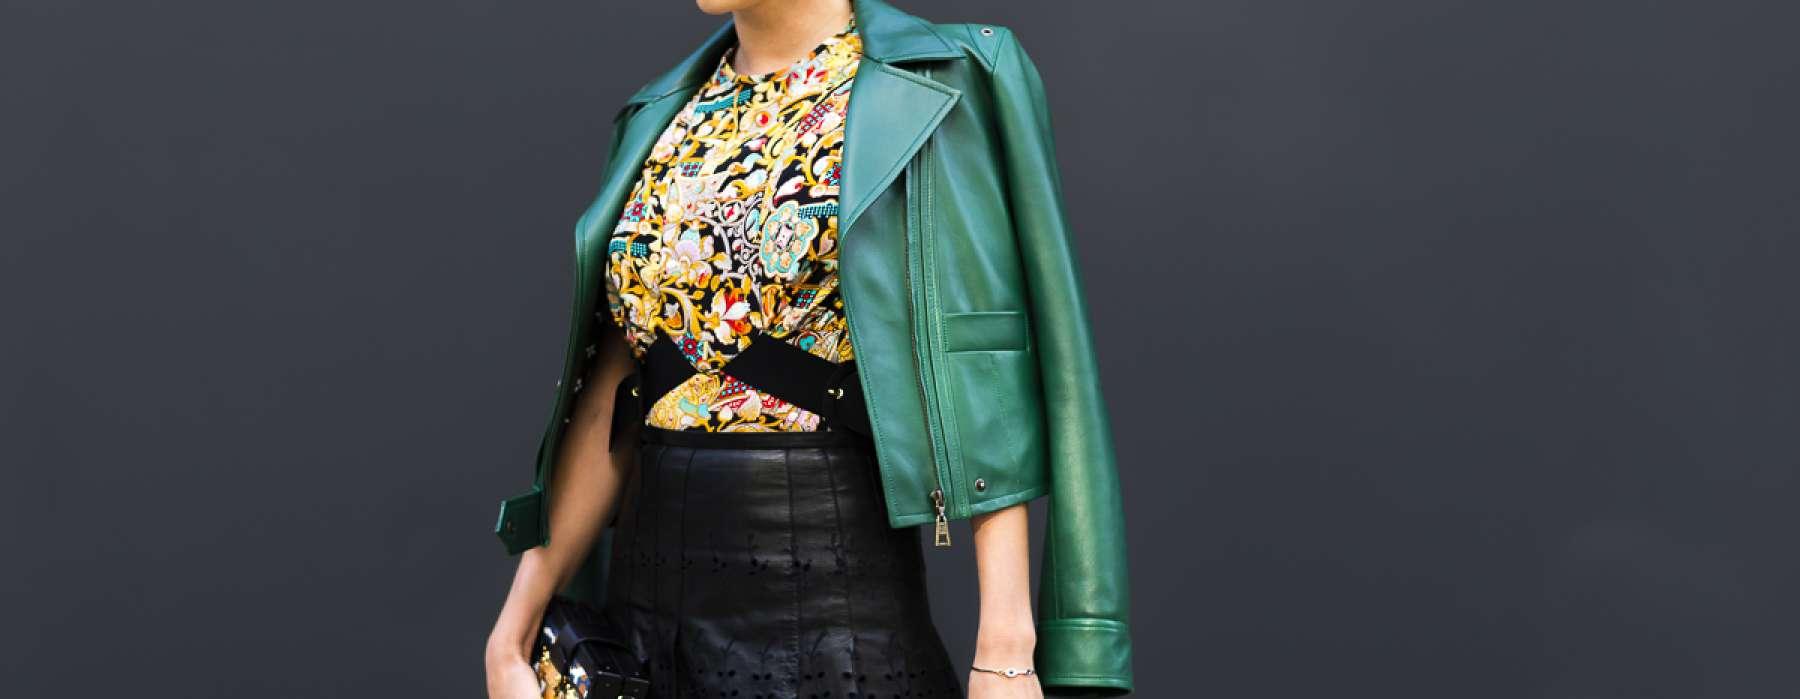 Eight general fashion mistakes